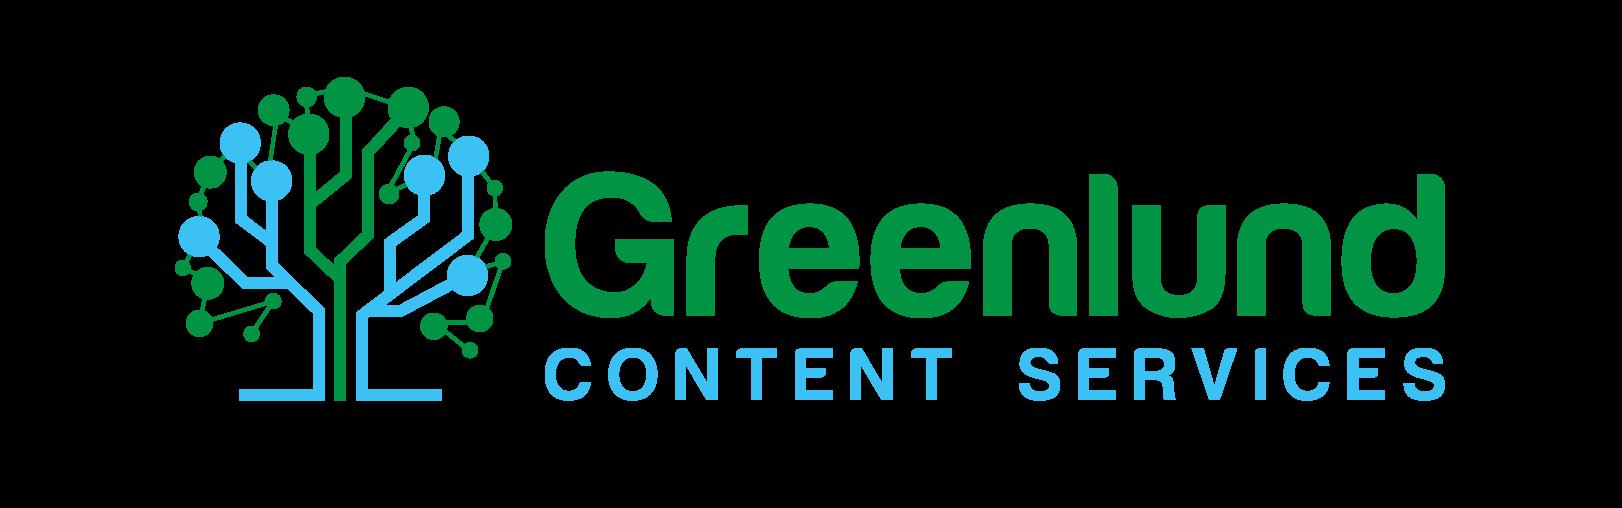 Content Marketing for B2B - Kaitlin Morrison